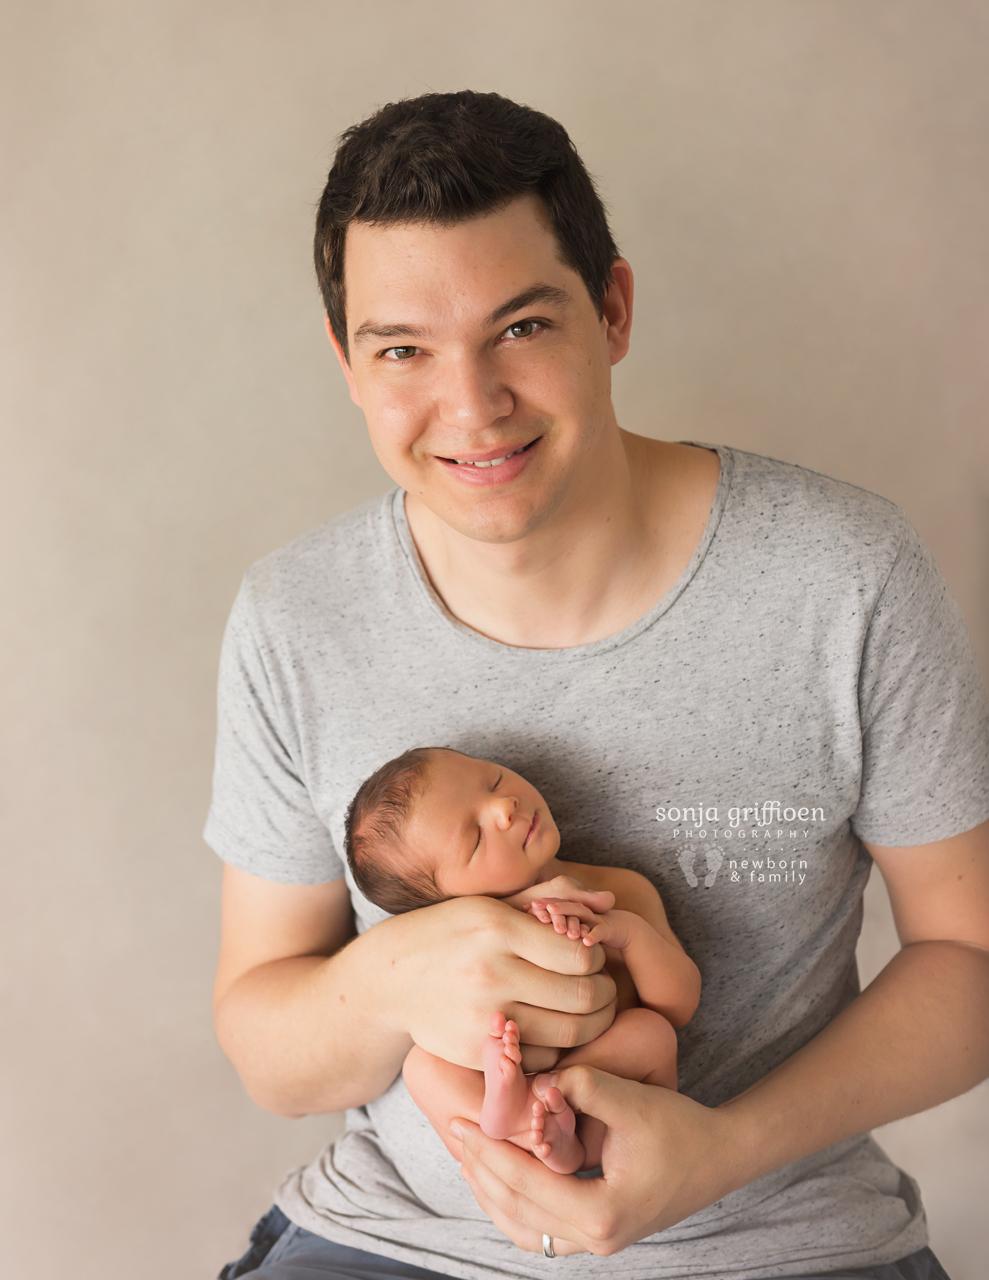 Caleb-Newborn-Brisbane-Newborn-Photographer-Sonja-Griffioen-05.jpg